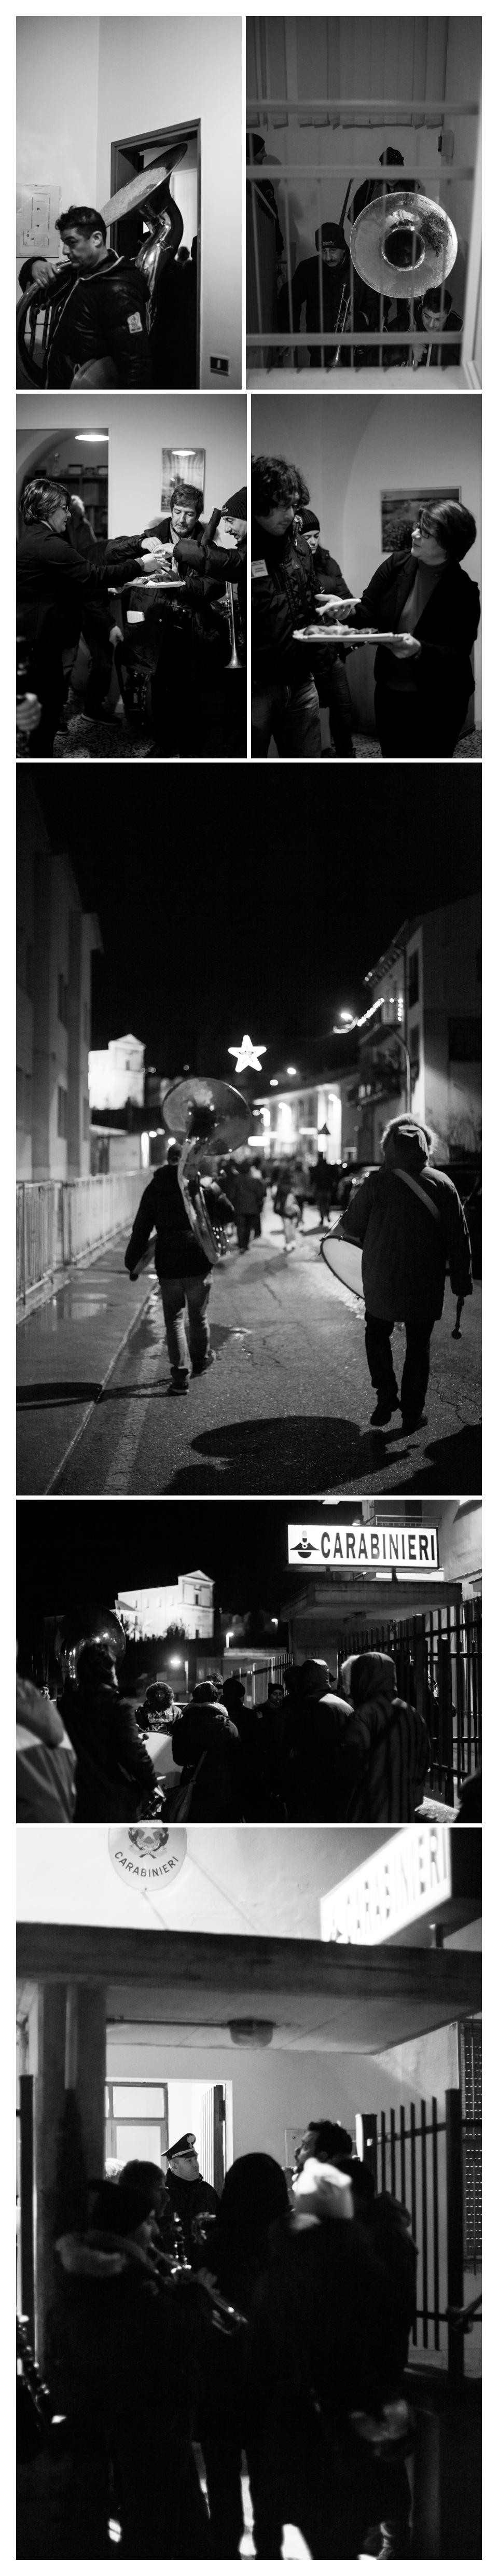 Visadorno 2014 - Torino di Sangro